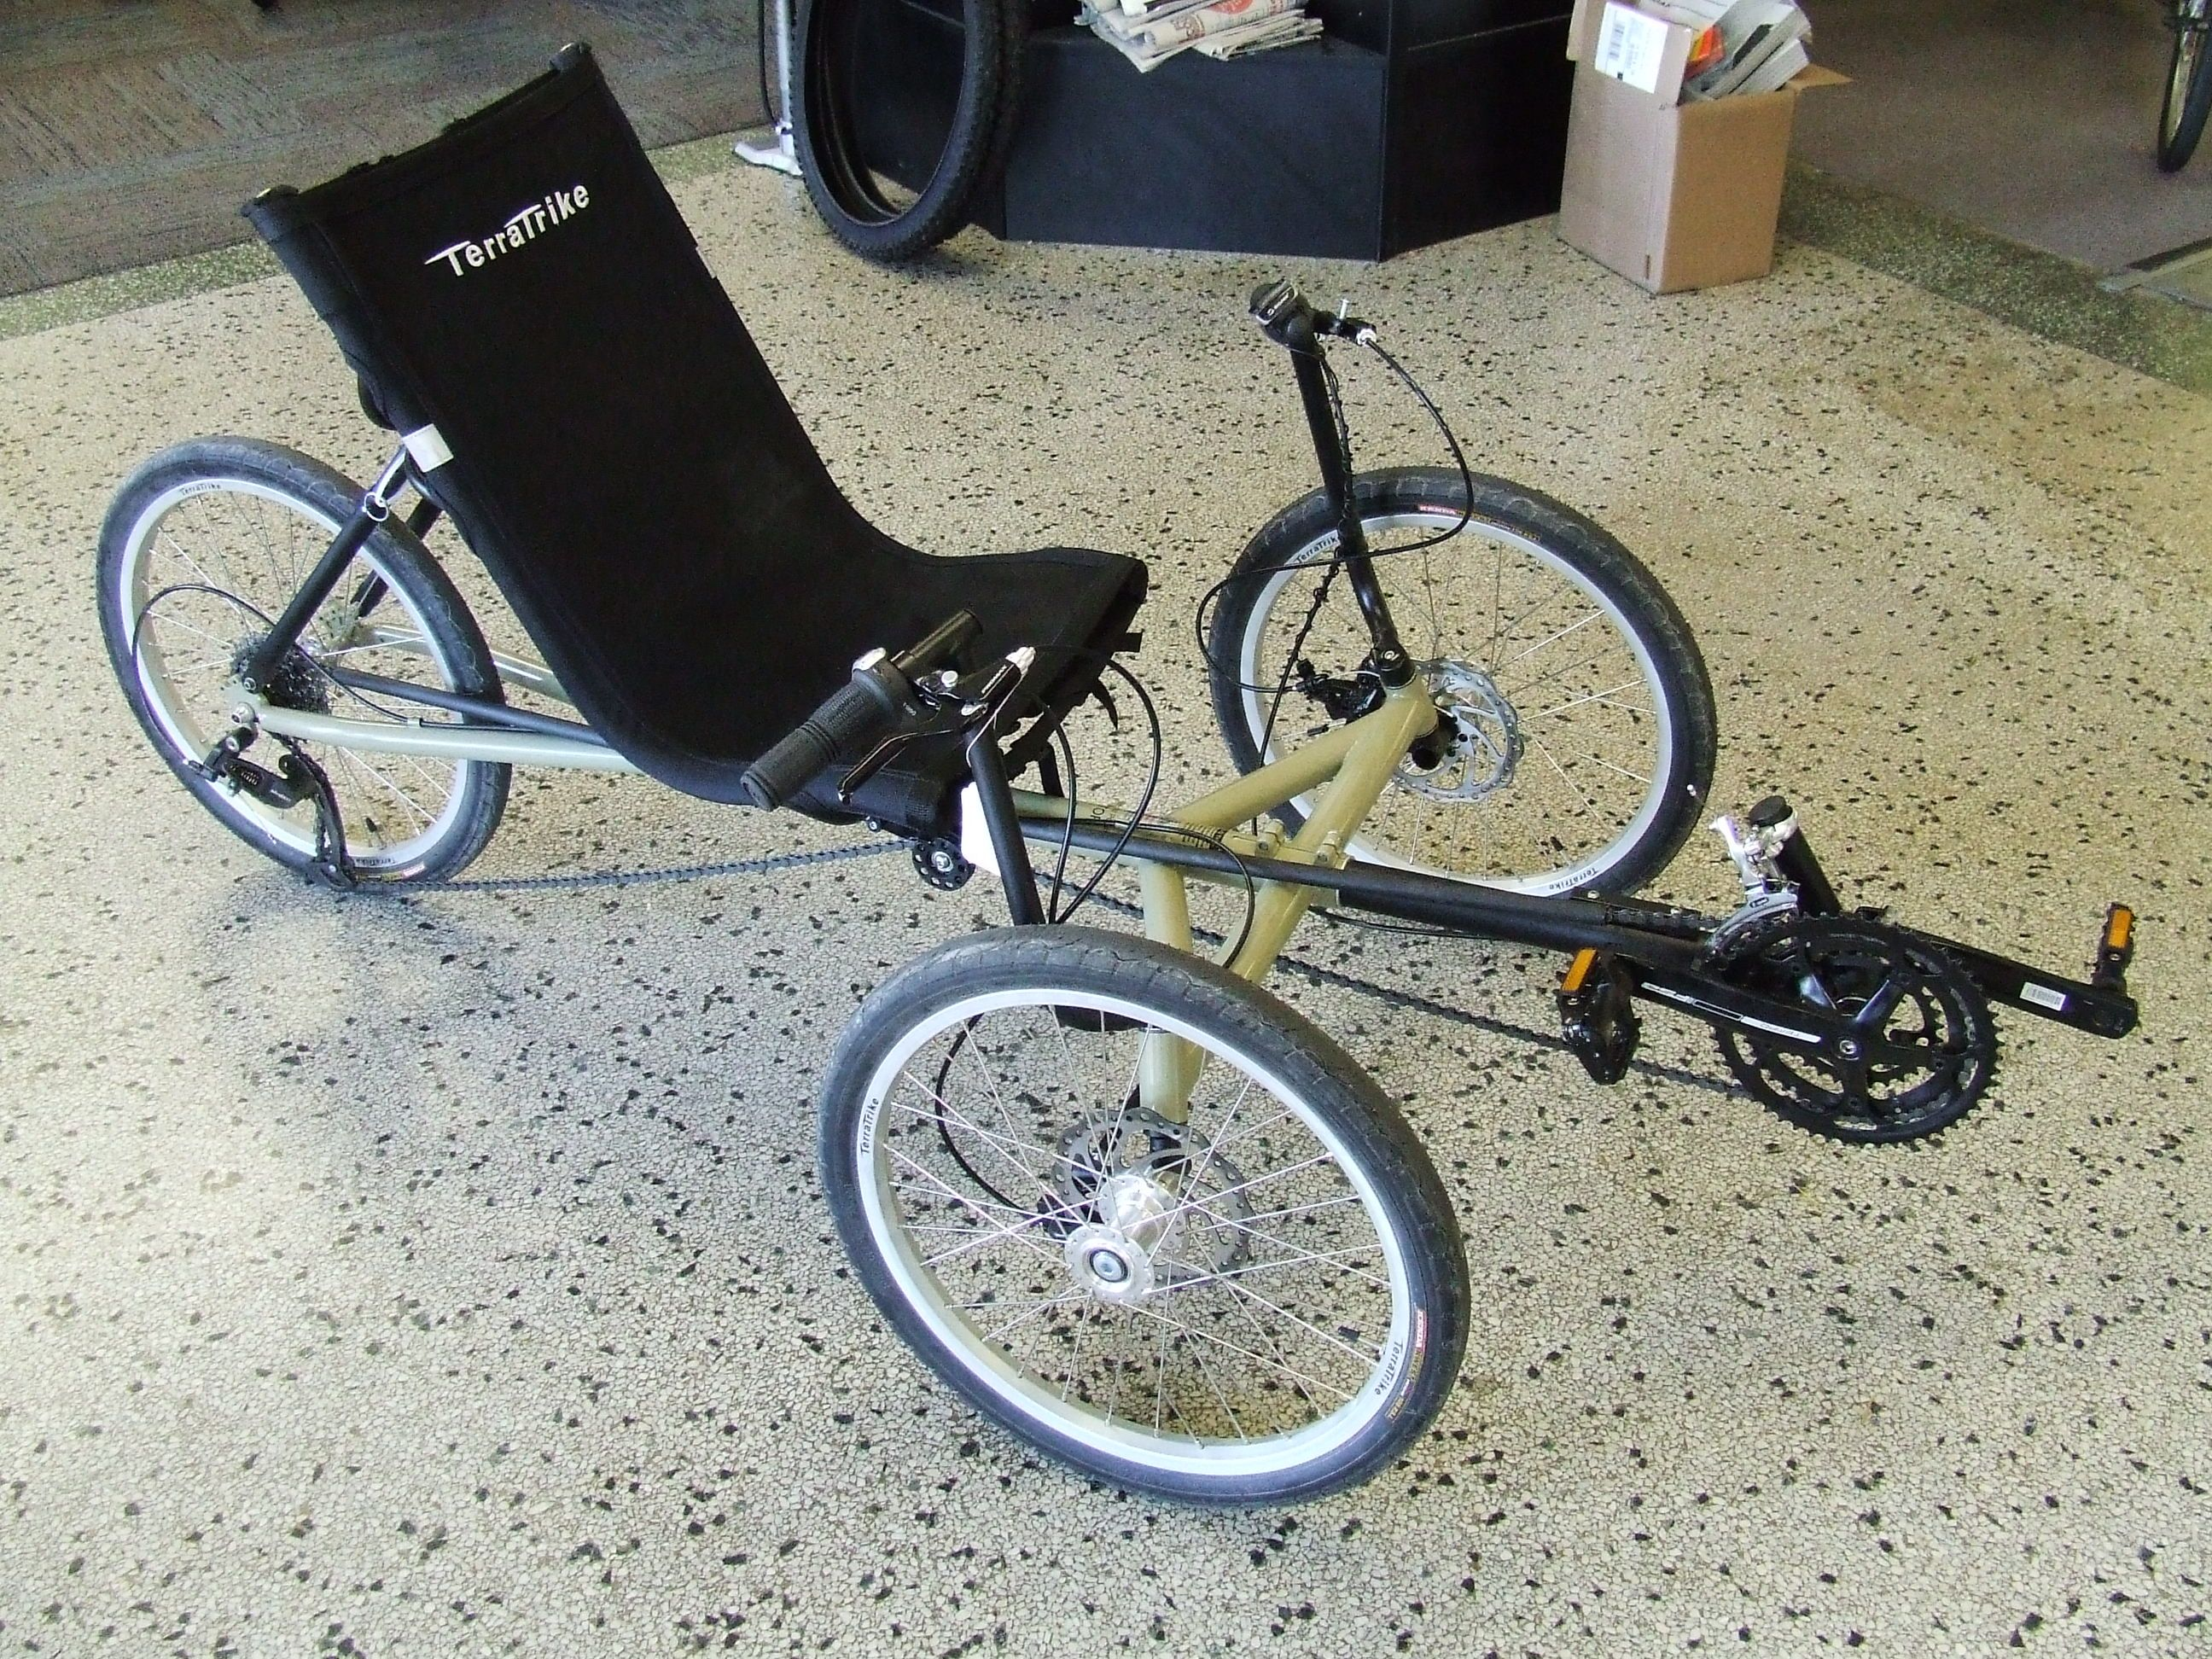 Used Recumbent Tricycles Recumbent Trikes And Quads Recumbent Bicycle Tricycle Trike